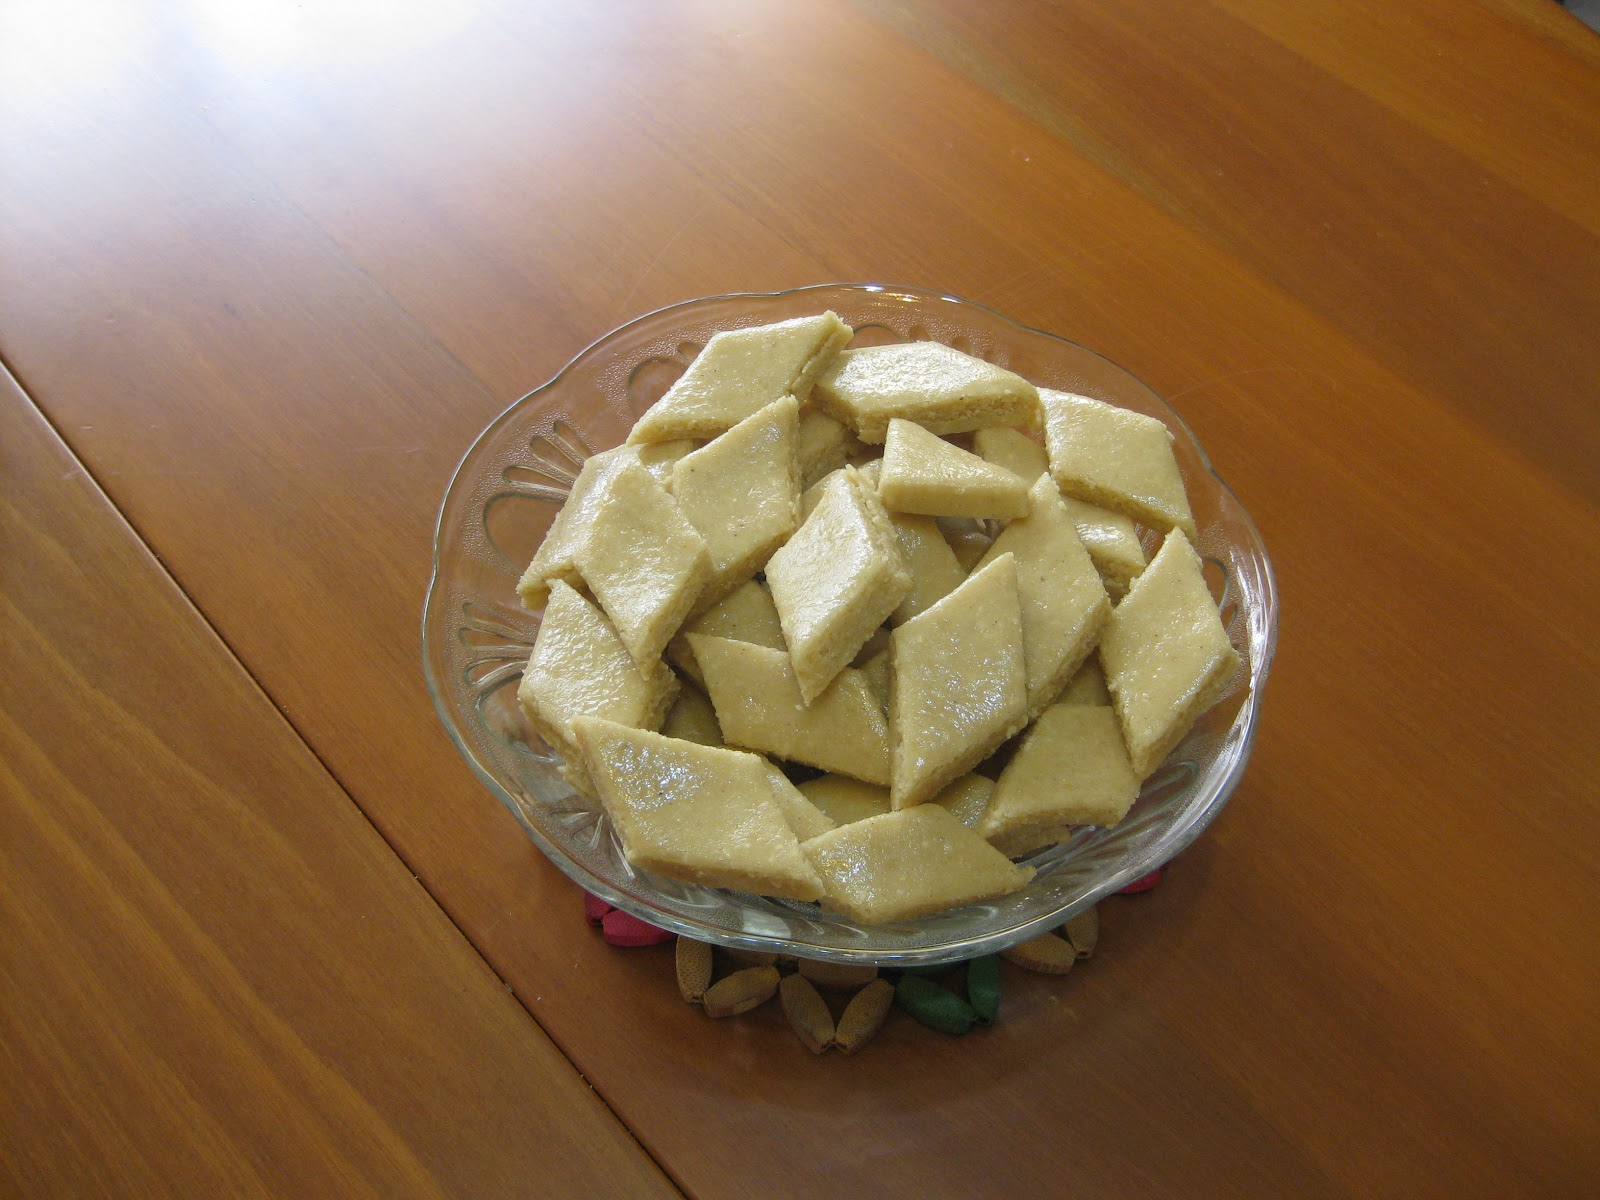 Kaju katli andhra recipes telugu vantalu gayatri vantillu note following is not a video its only a photo forumfinder Gallery